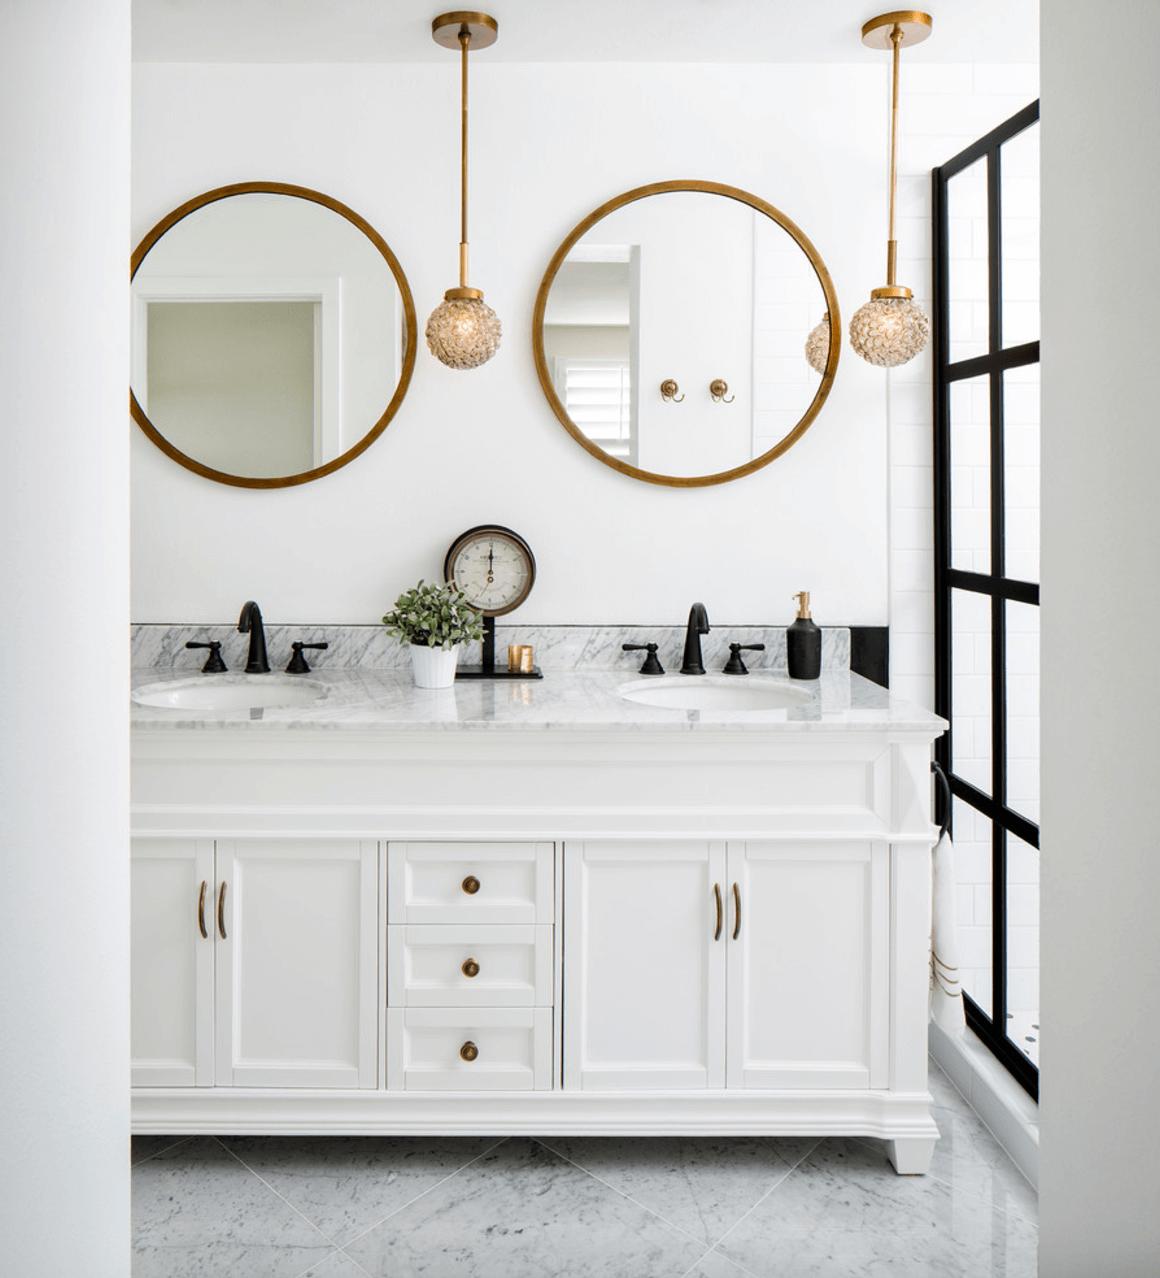 15 Home Design Trends That Rocked 2016 Round Mirror Bathroom